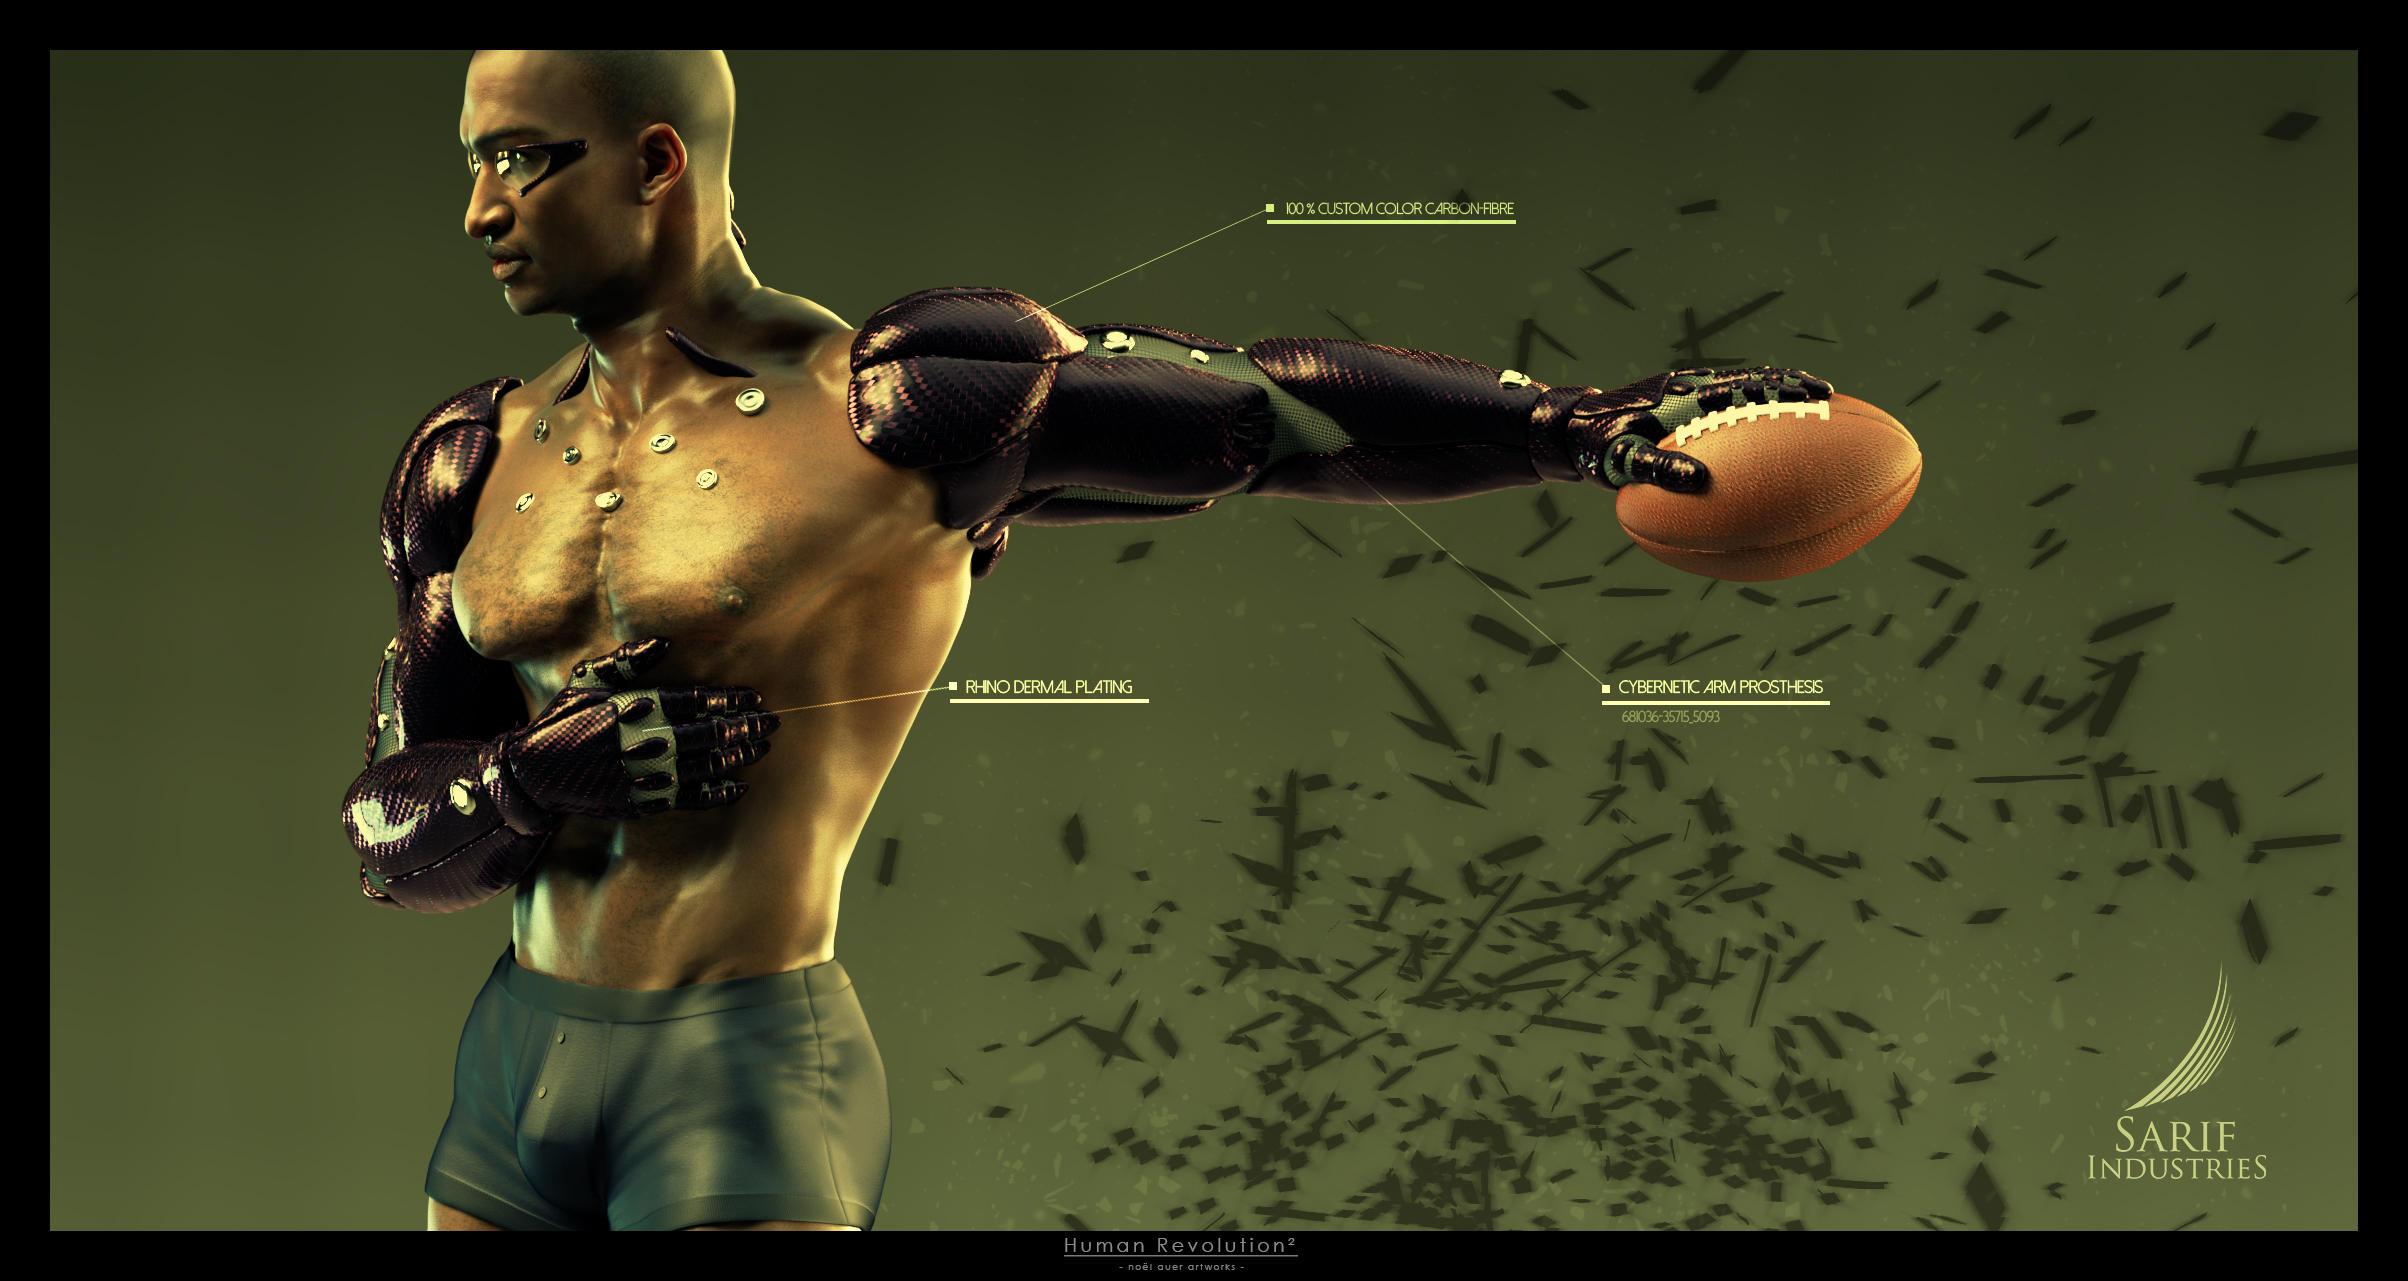 Human Revolution 2 by TRRazor